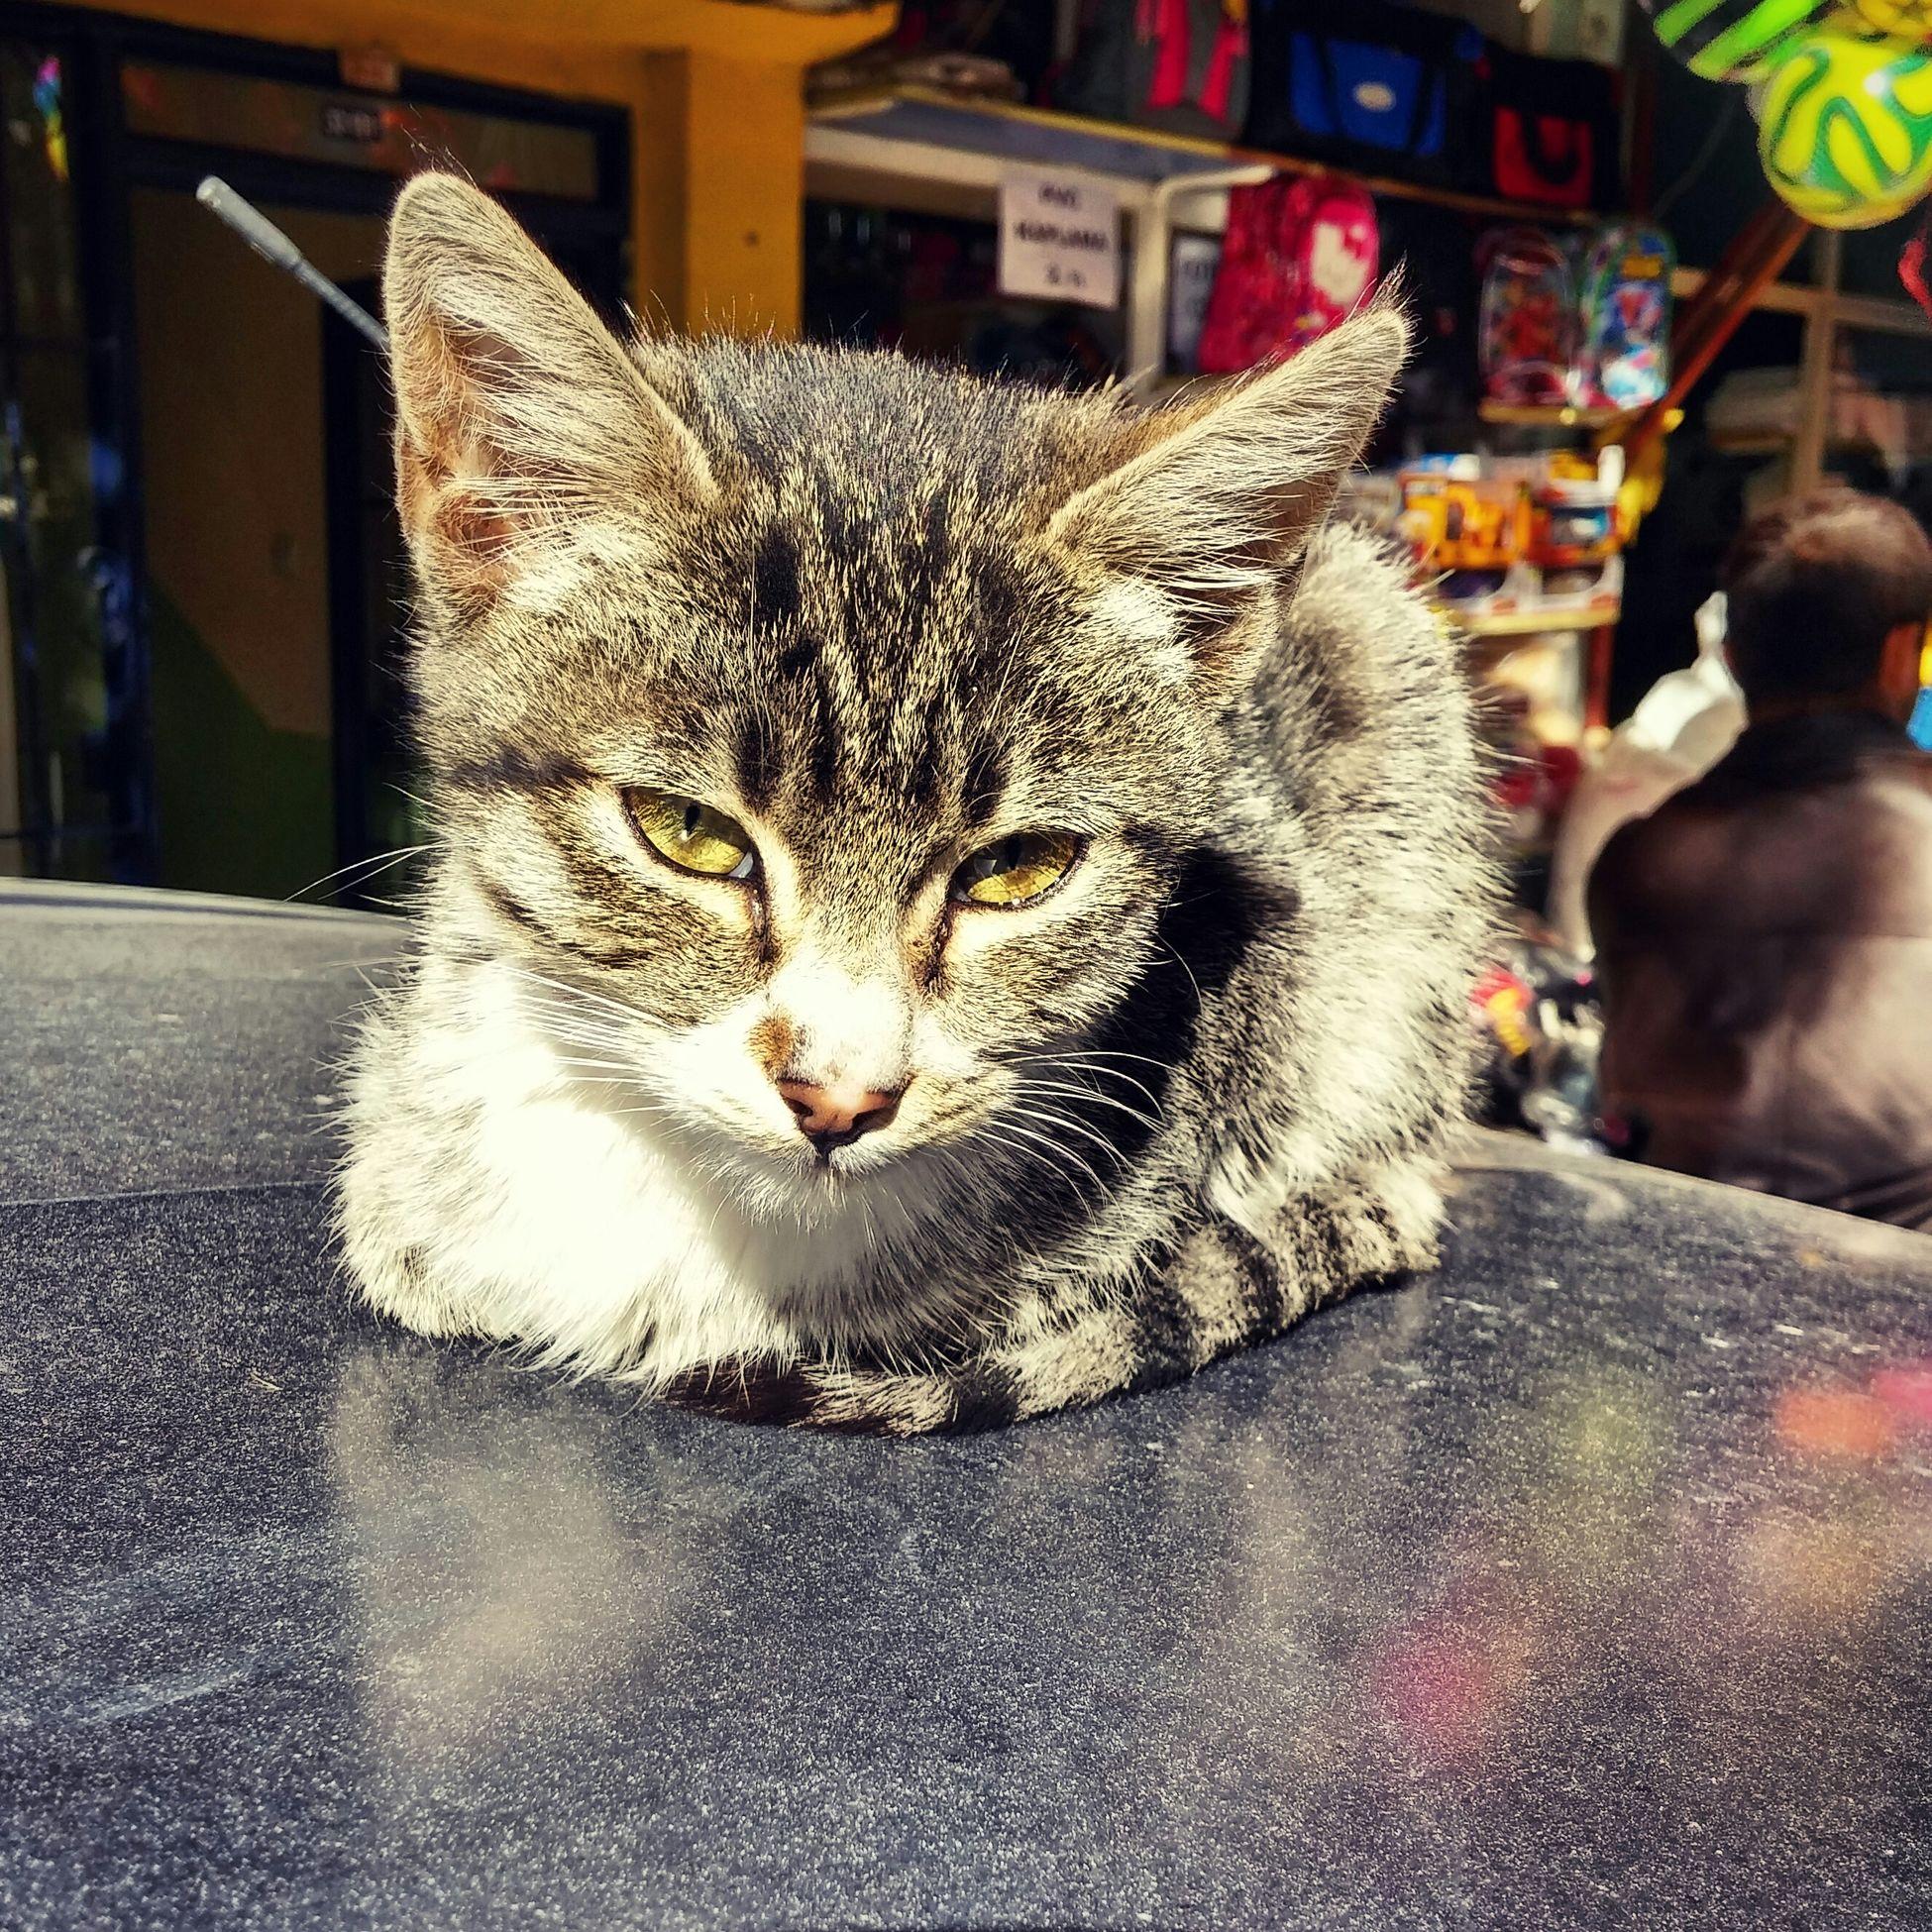 Catsagram Nature_collection Animals Cat Kedicik Minik Kedicik çokminnoş♥♥ Streetart Street Art Cool Stuff